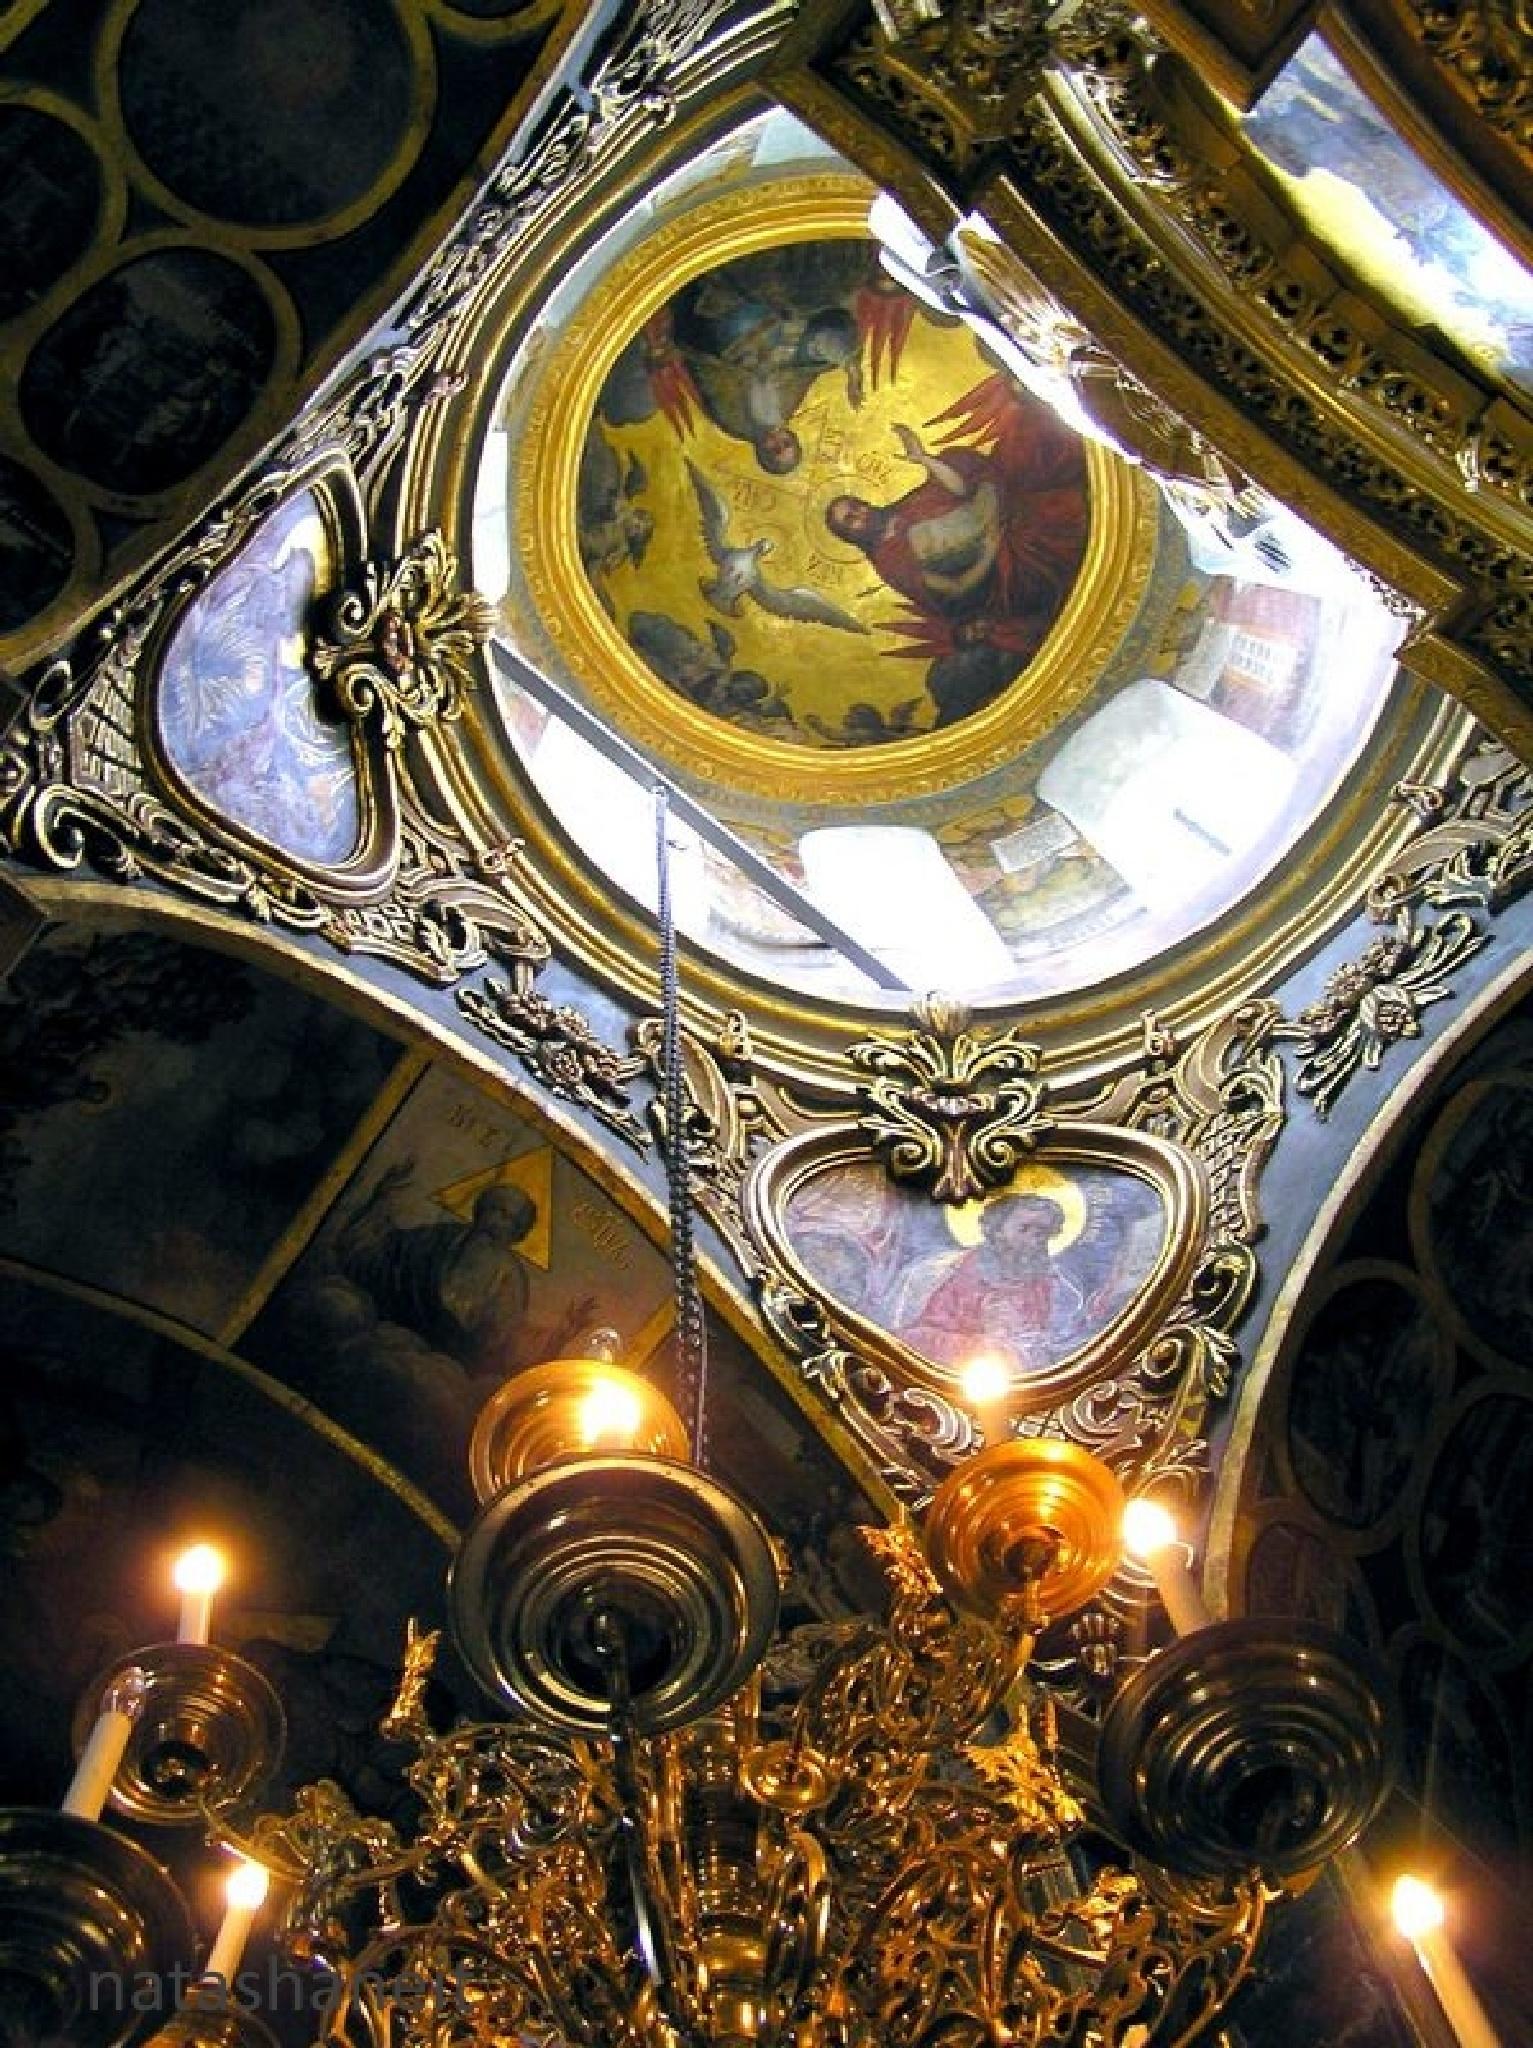 Holy Trinity - the dome of St. Nicholas Church Monastery by natashaneit